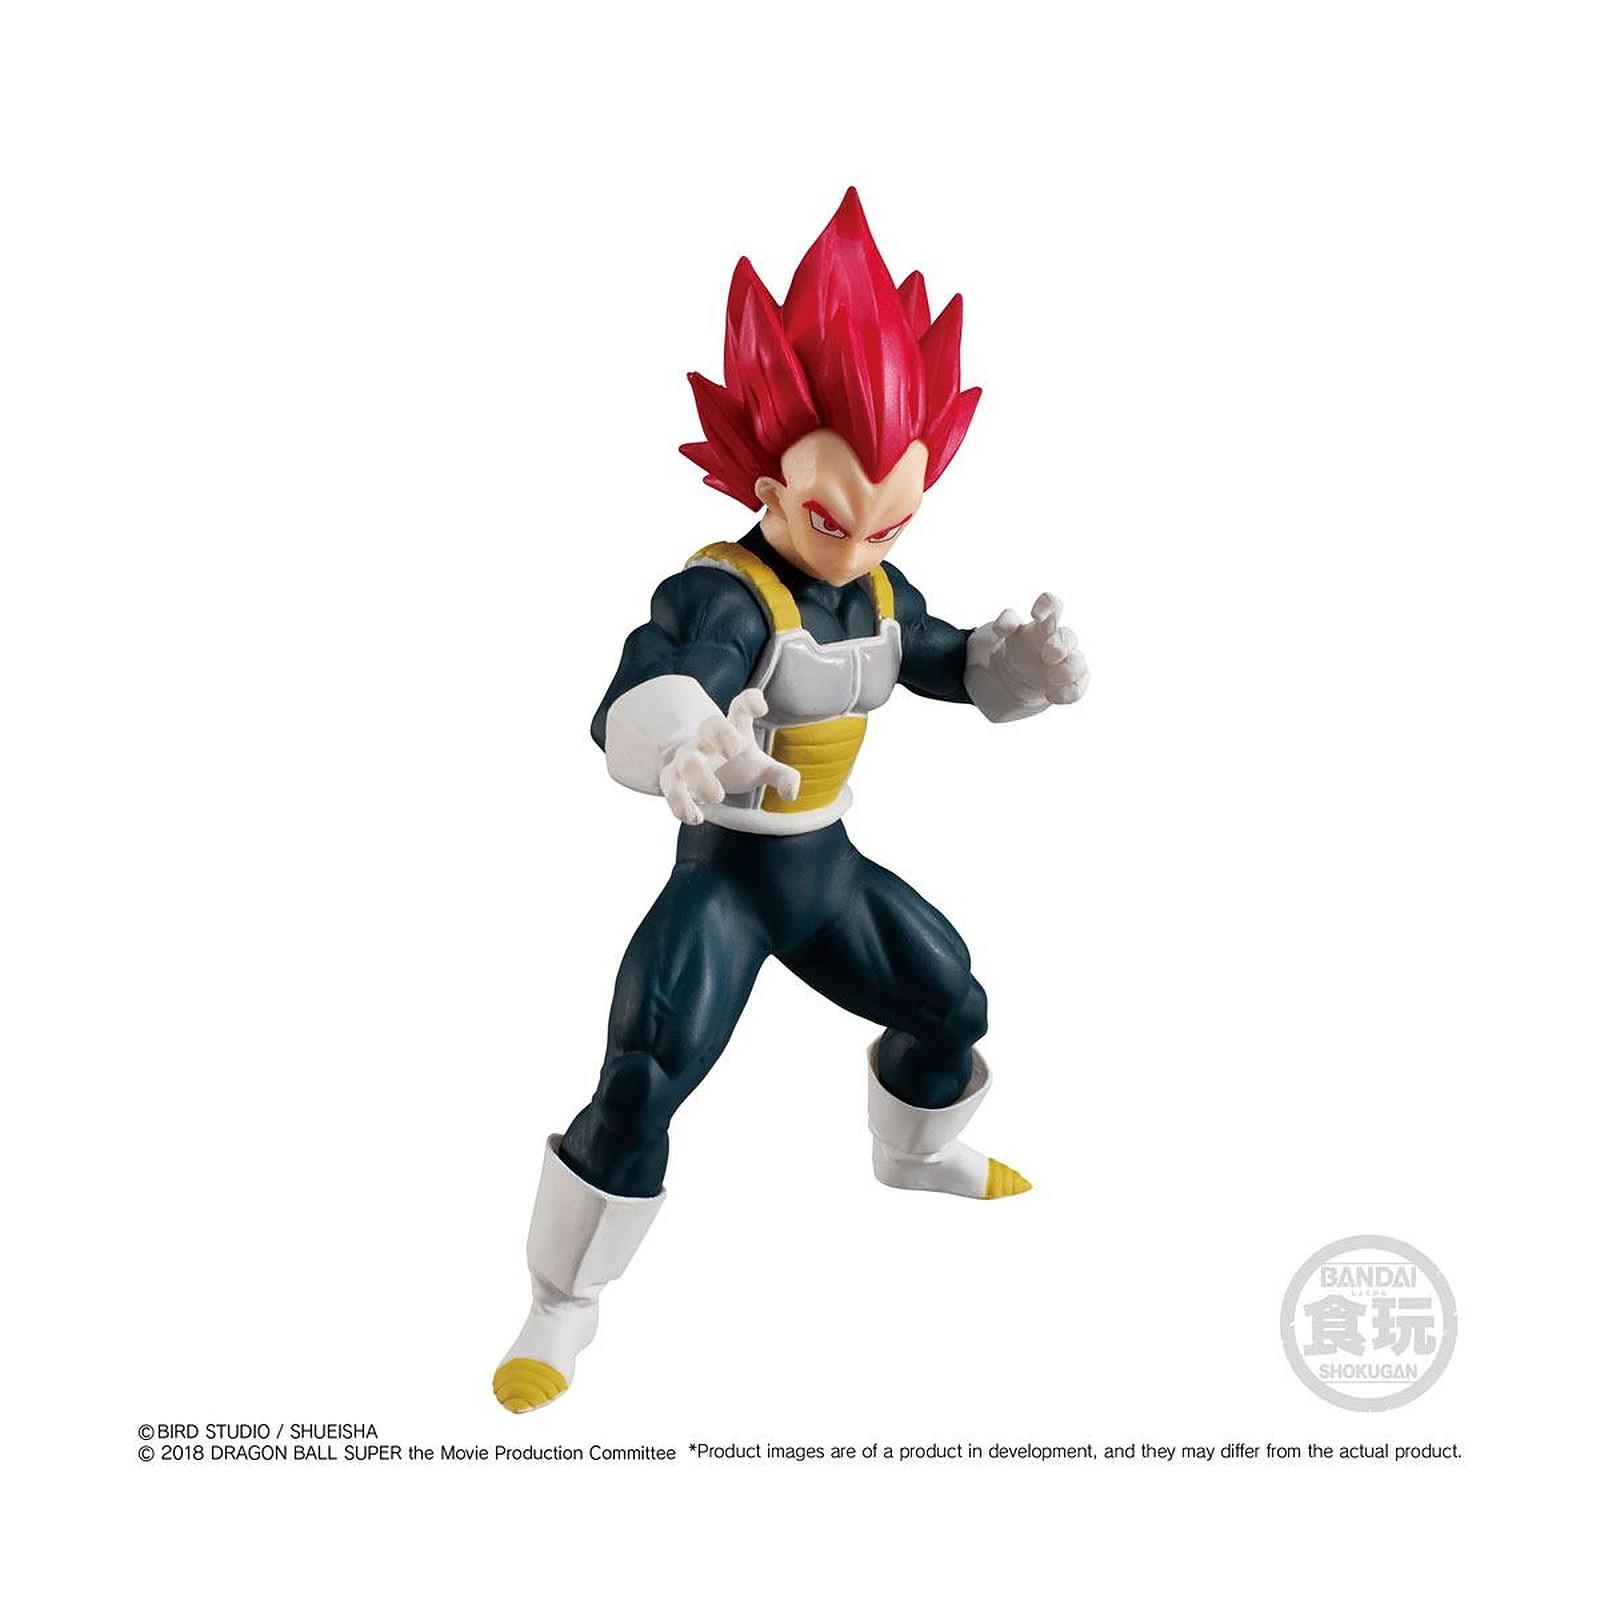 Dragon Ball Super - Figurine Styling Collection Super Saiyan God Vegeta 11 cm